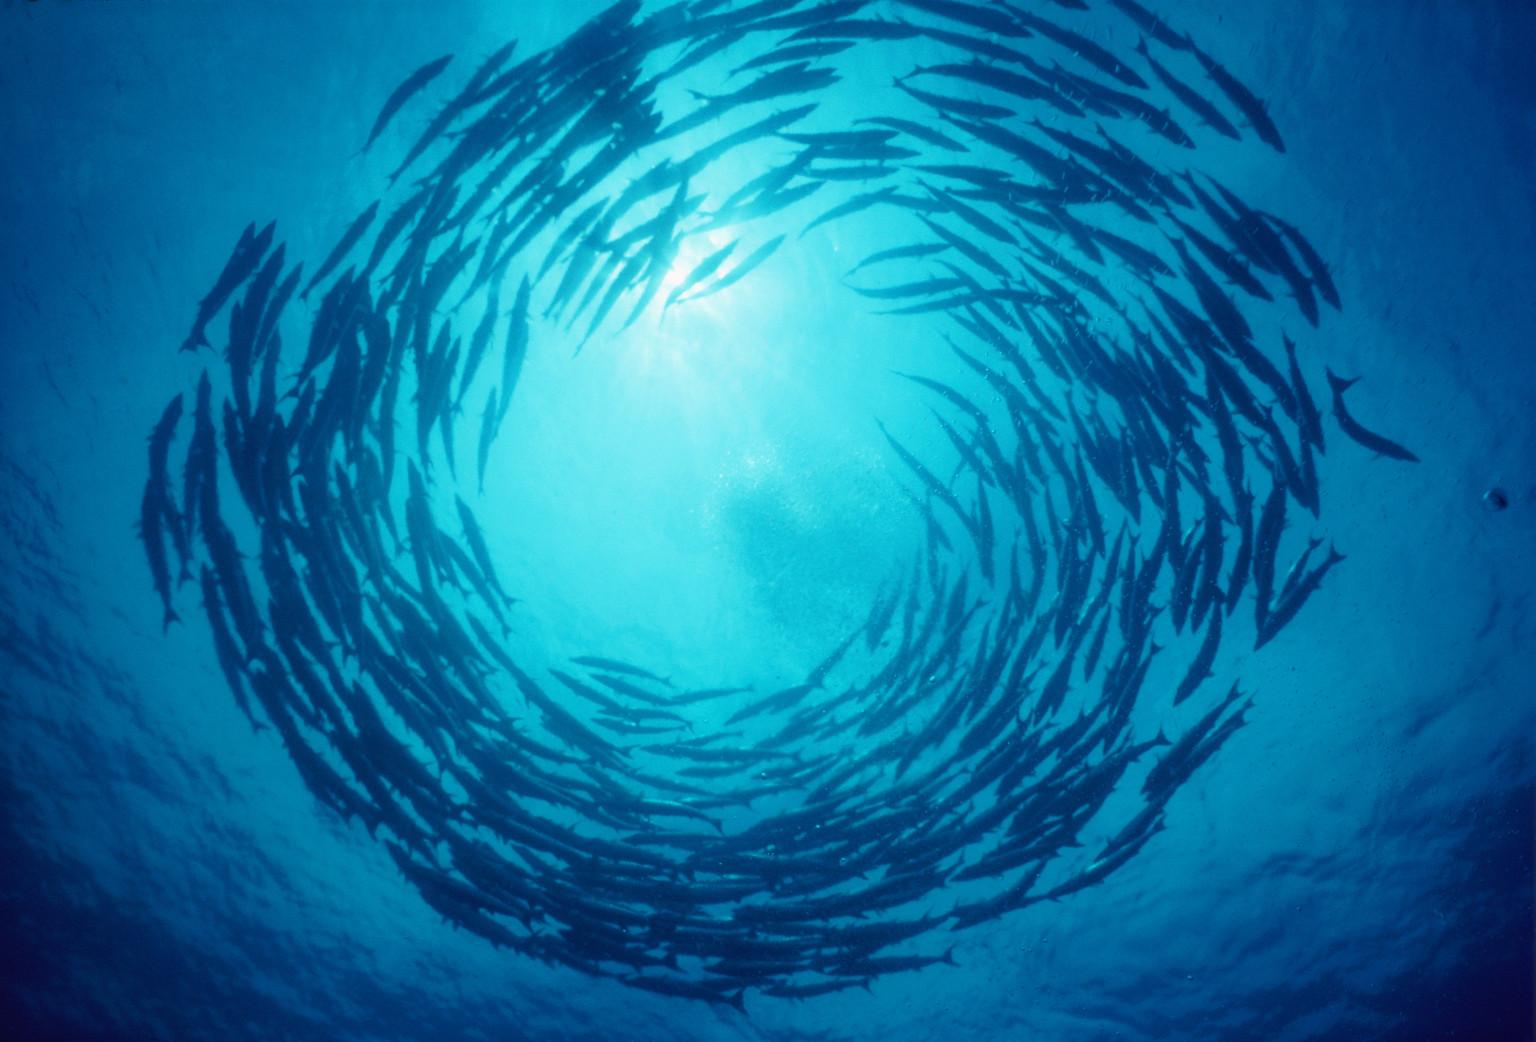 39 fish storms 39 nourish marine life as tarpon transmit for School of fish